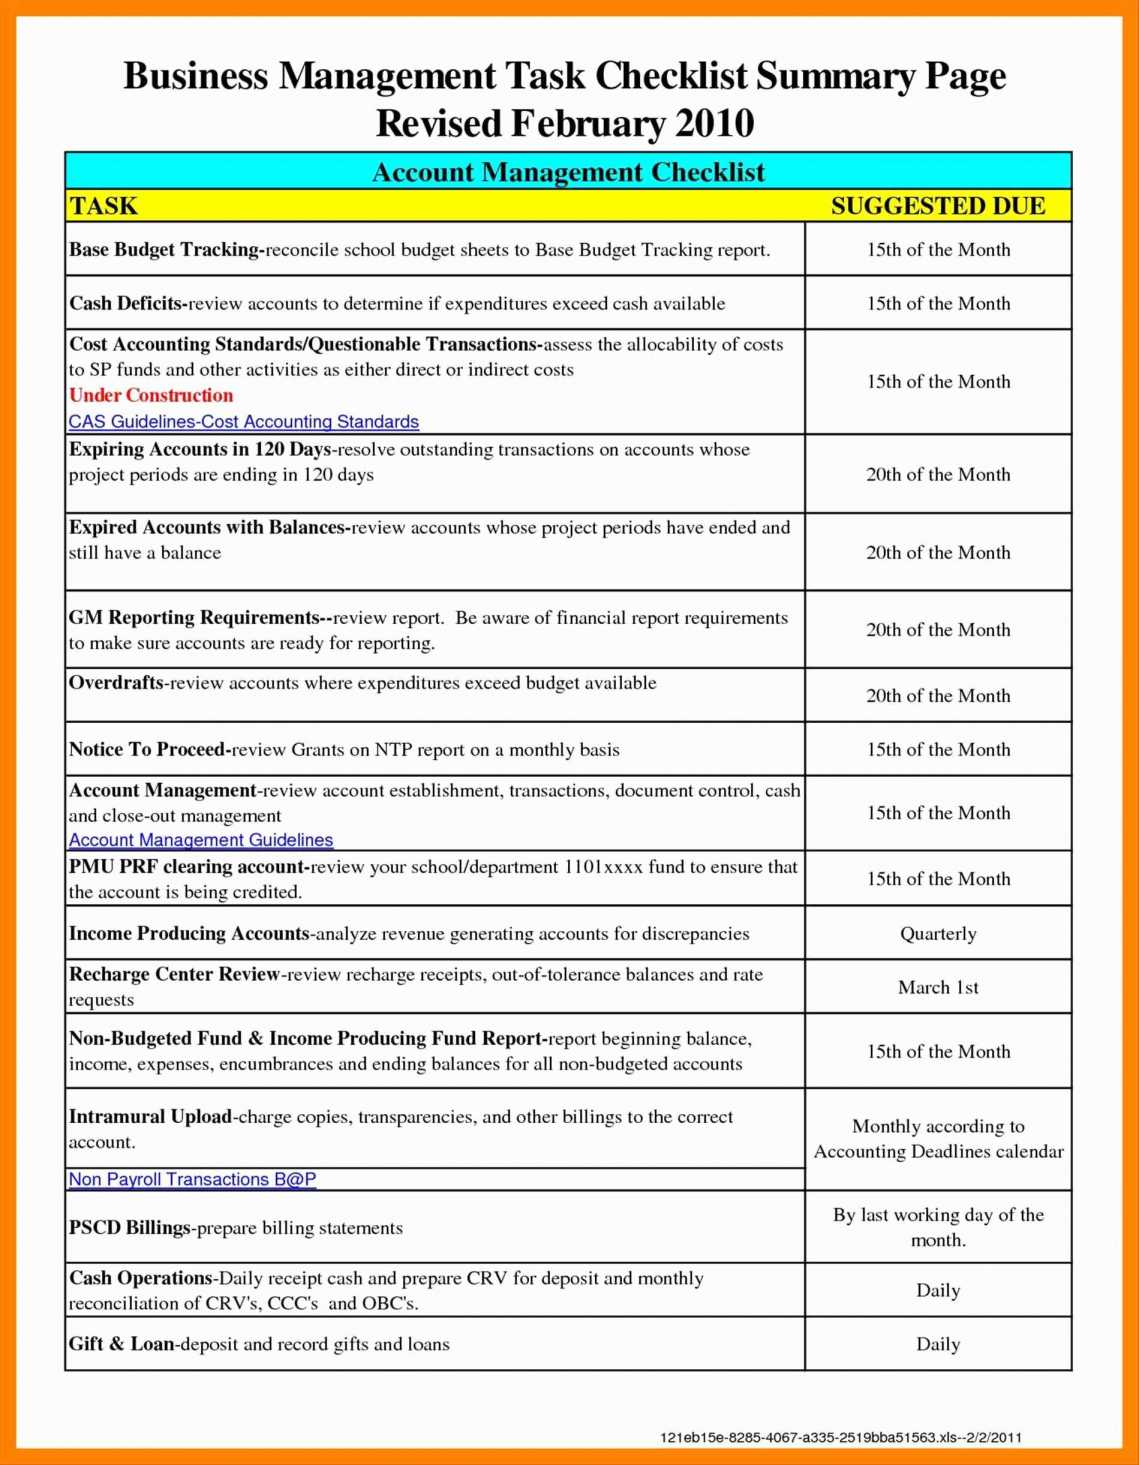 Job Tracking Spreadsheet Template | Worksheet & Spreadsheet 2018 Intended For Task Tracking Spreadsheet Template